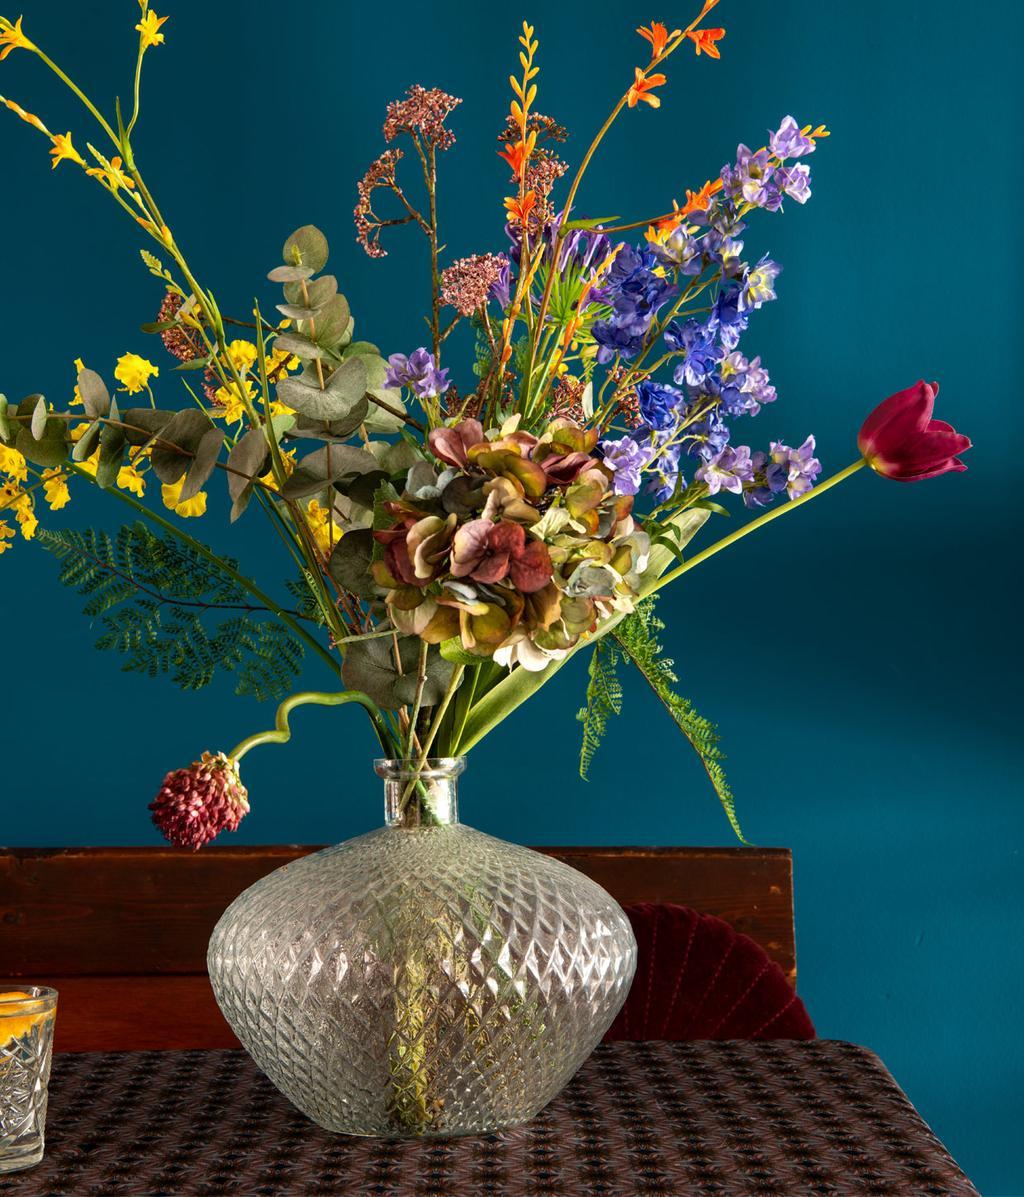 blauwe muur met daarvoor een transparante vaas met boeket bloemen  | indian summer